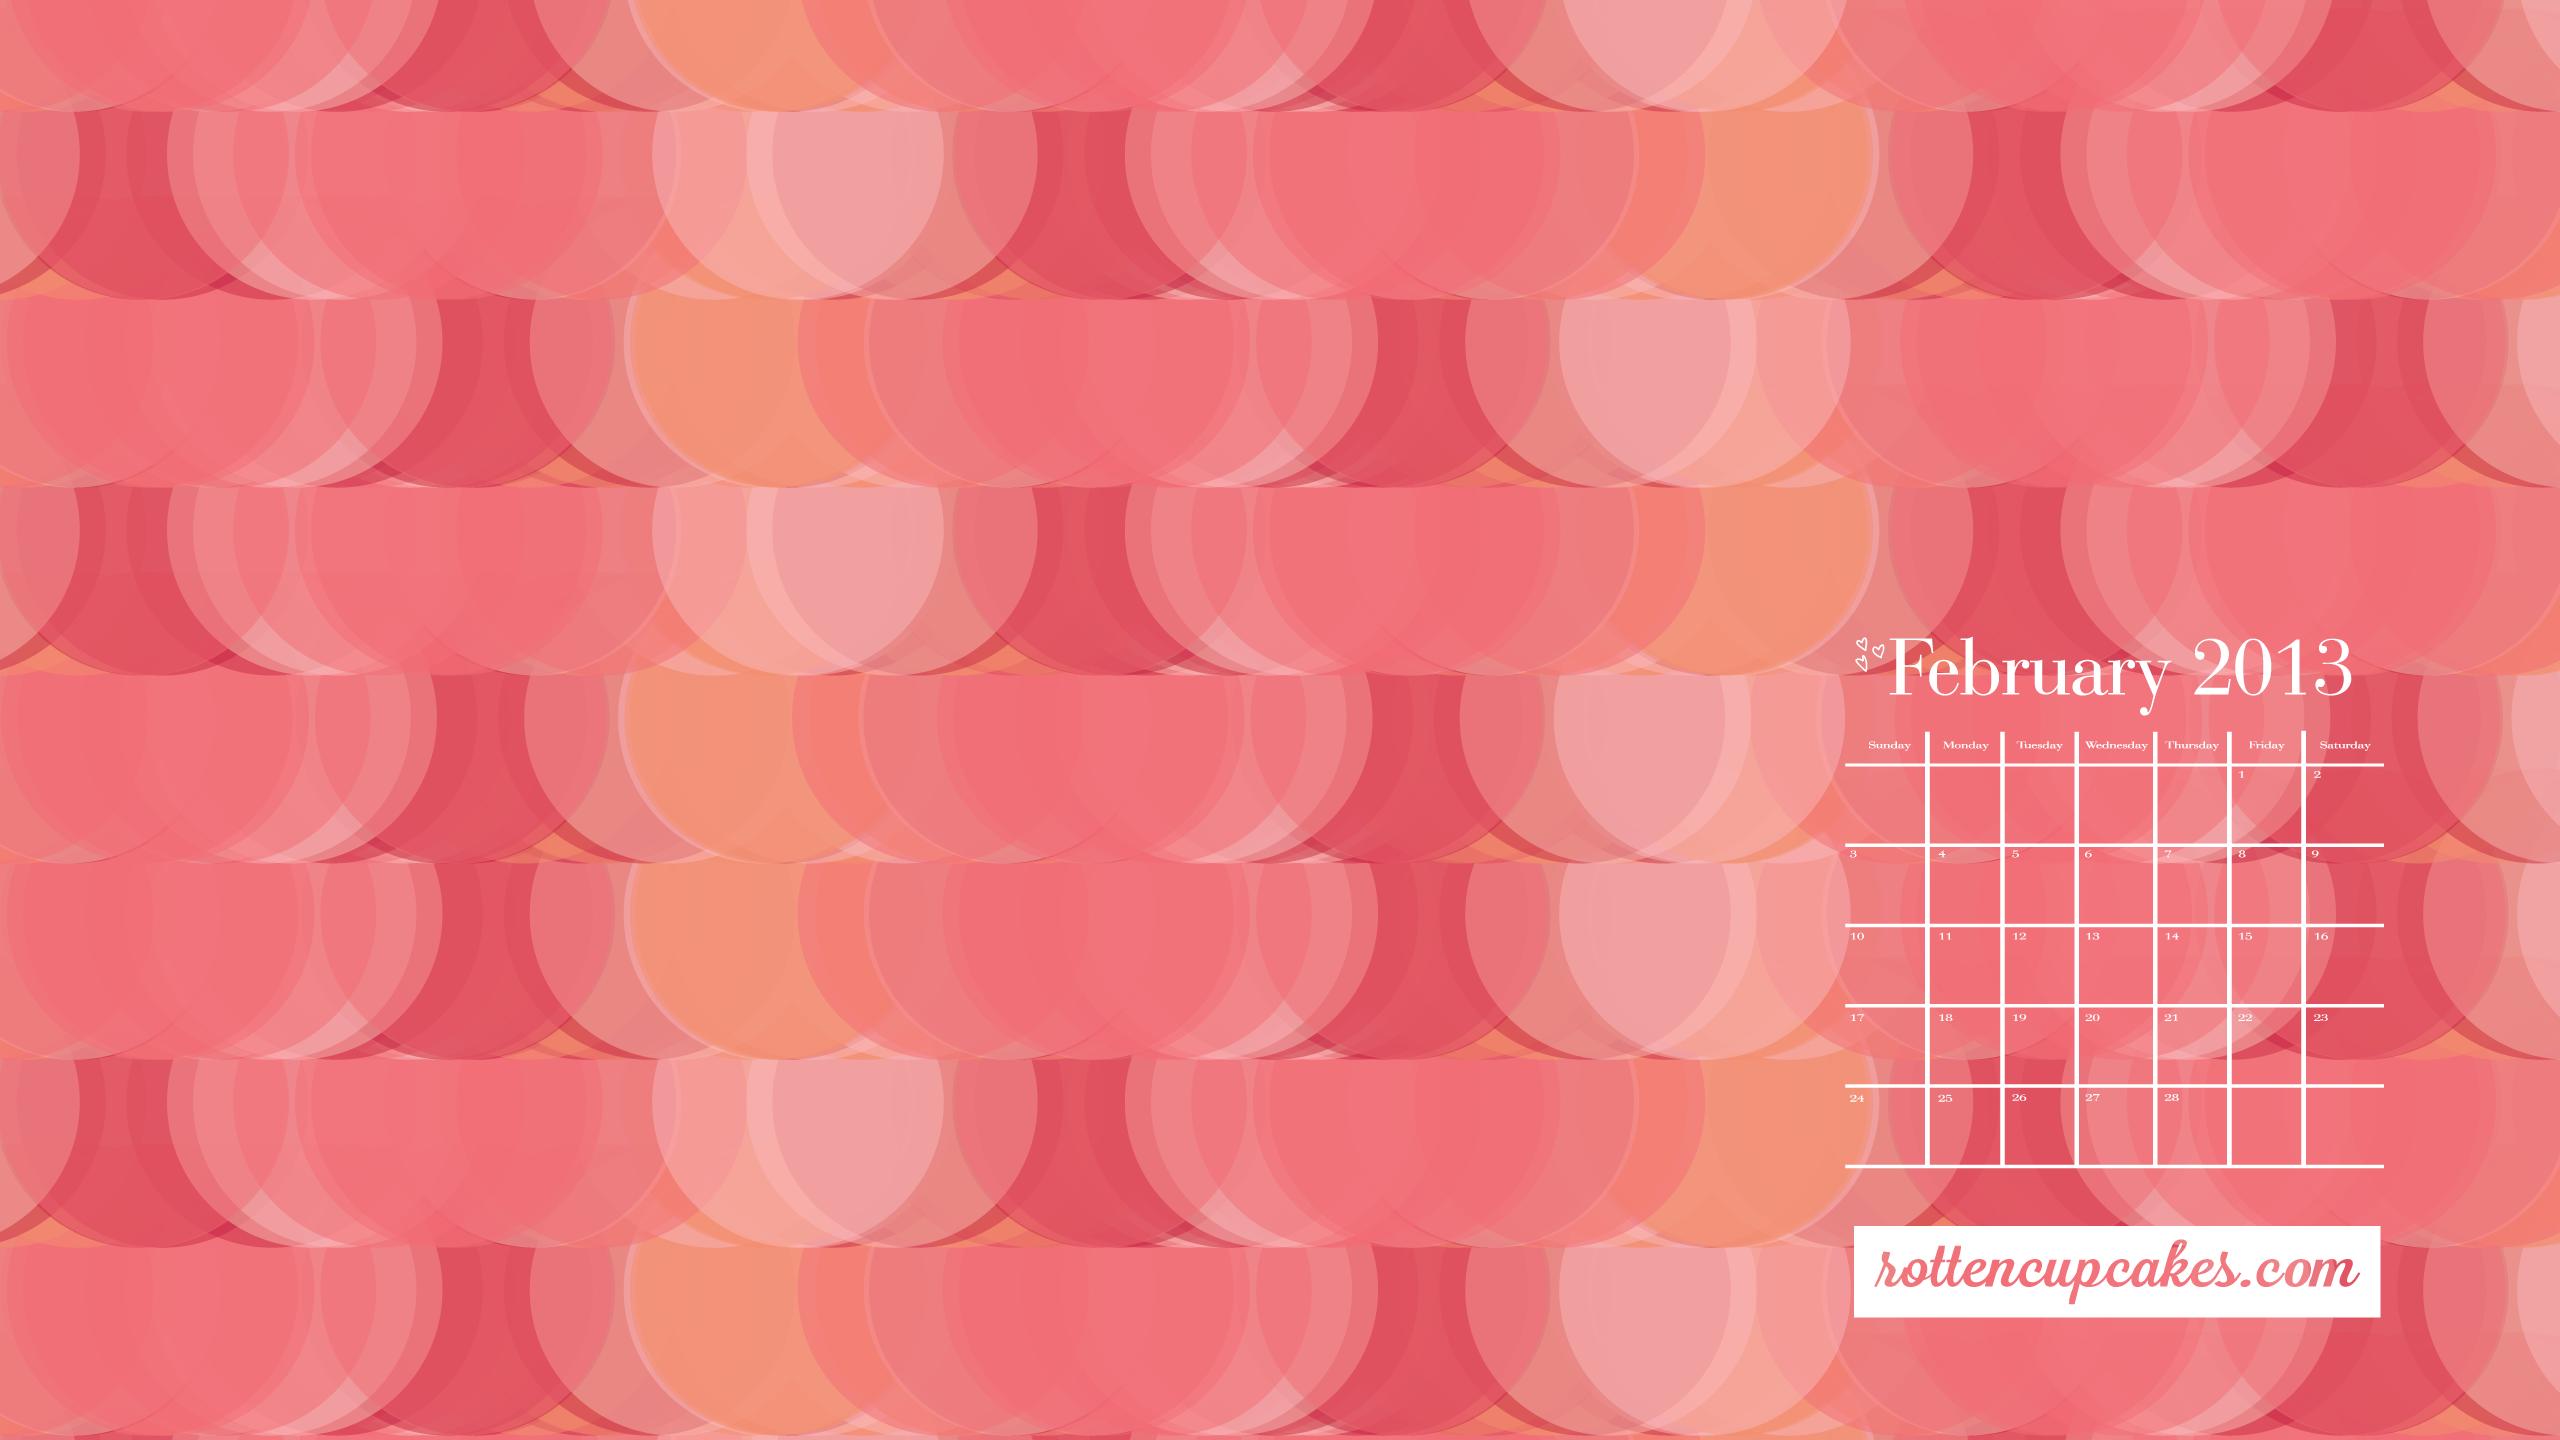 February 2013 calendar desktop iPhone wallpapers   rottencupcakes 2560x1440